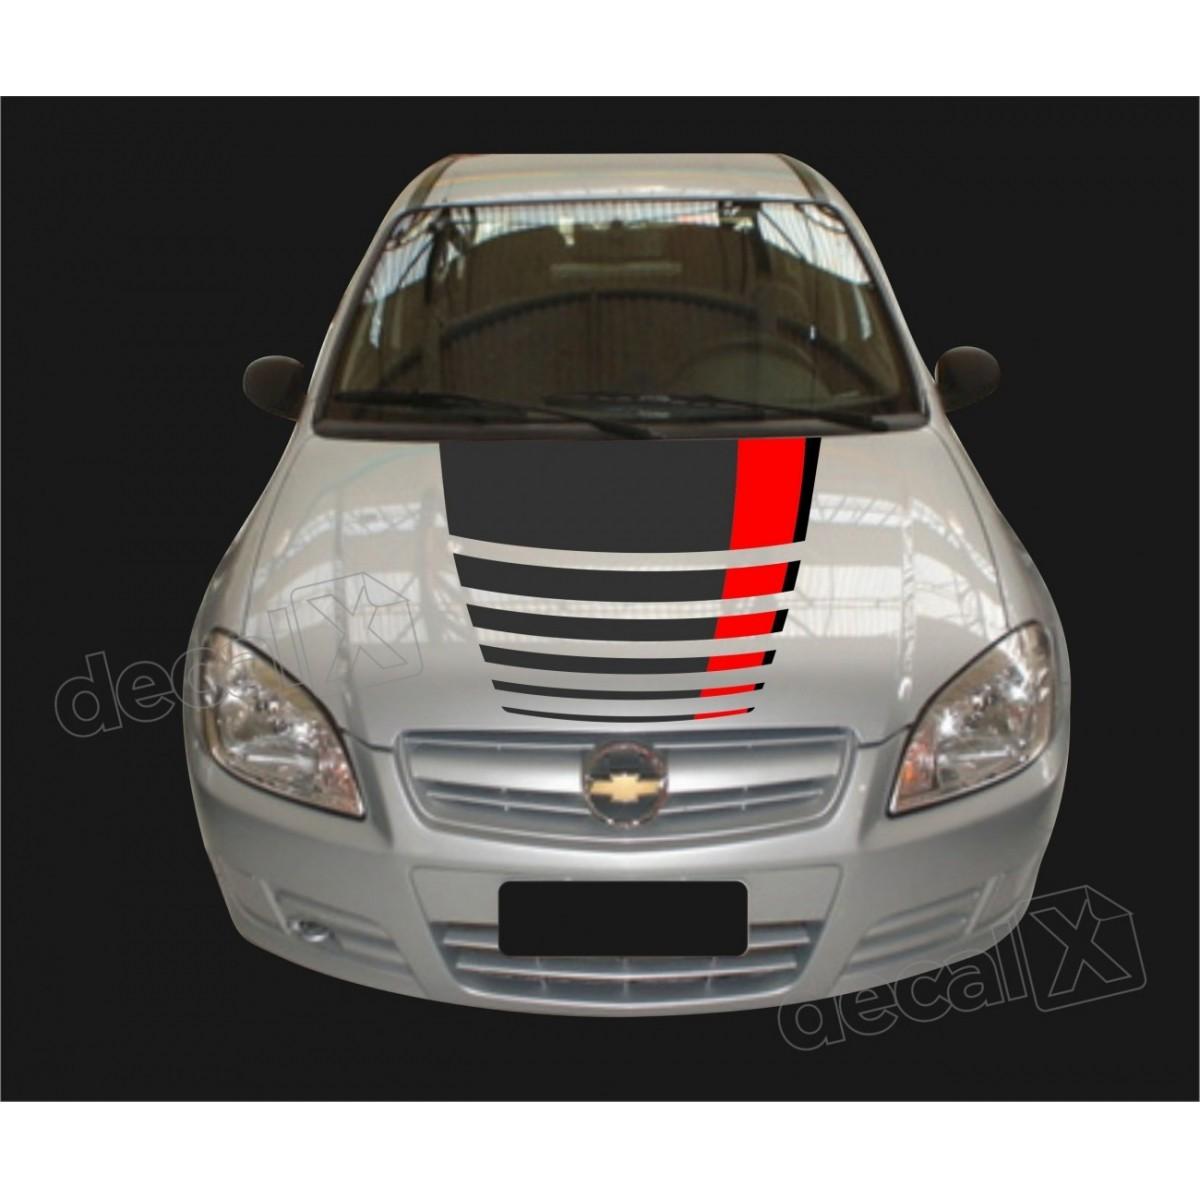 Adesivo Chevrolet Celta Faixa Capo 3m Ctm505